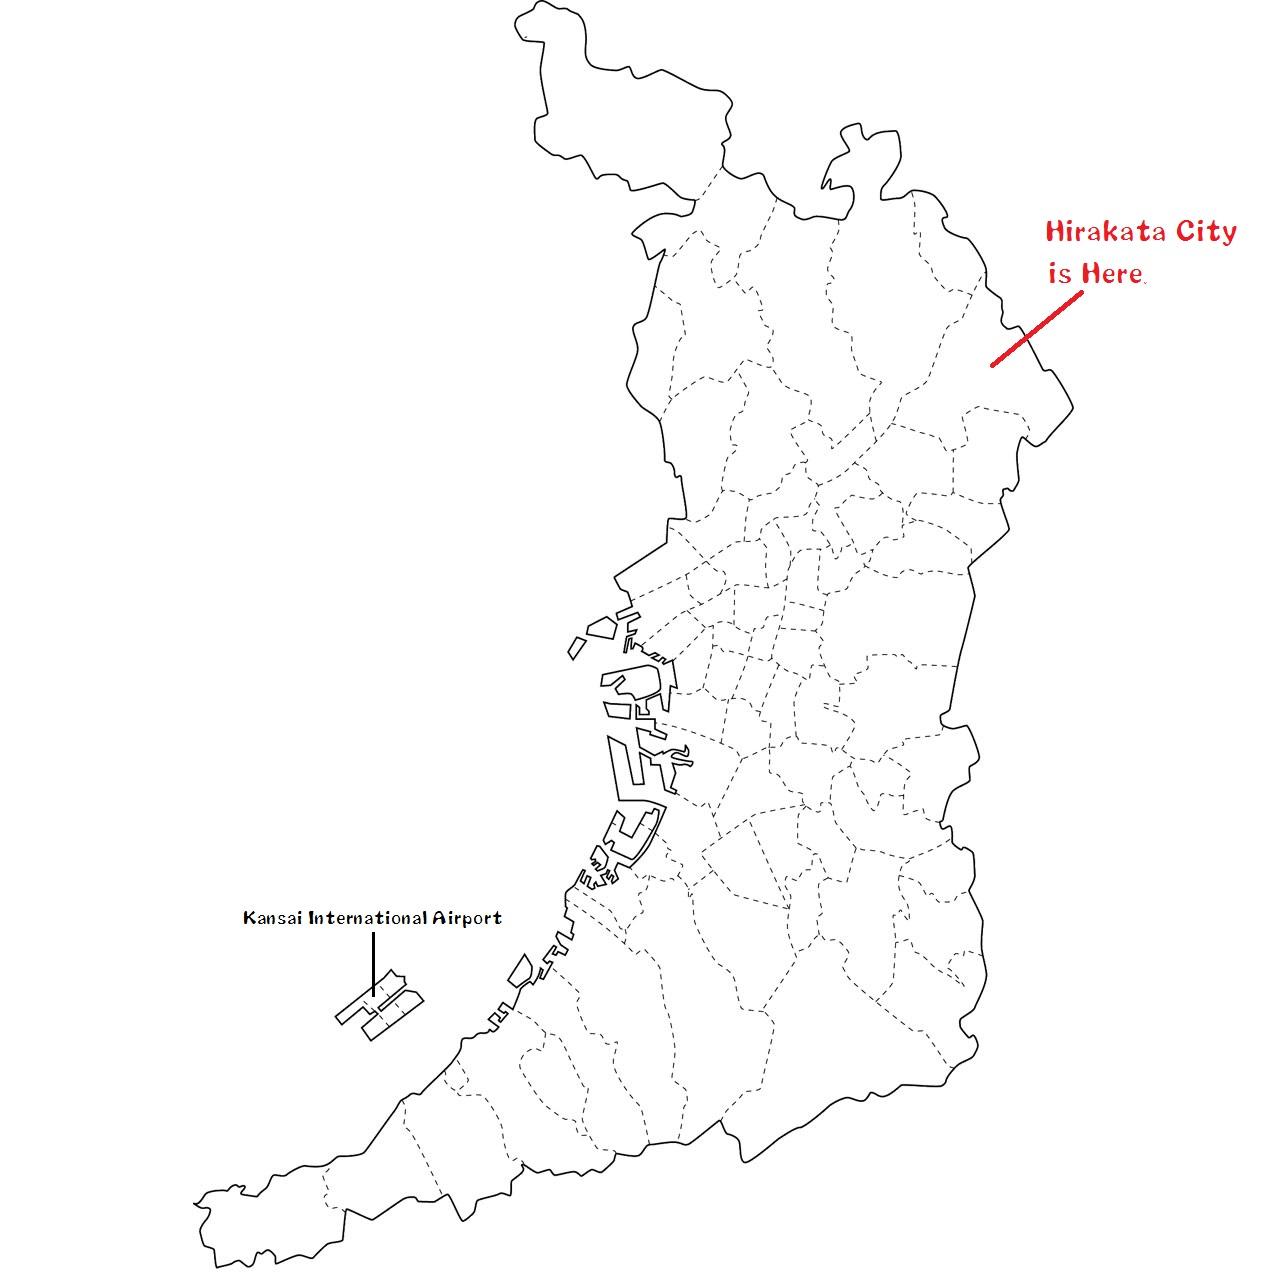 What is Hirakata City Hirakata Now